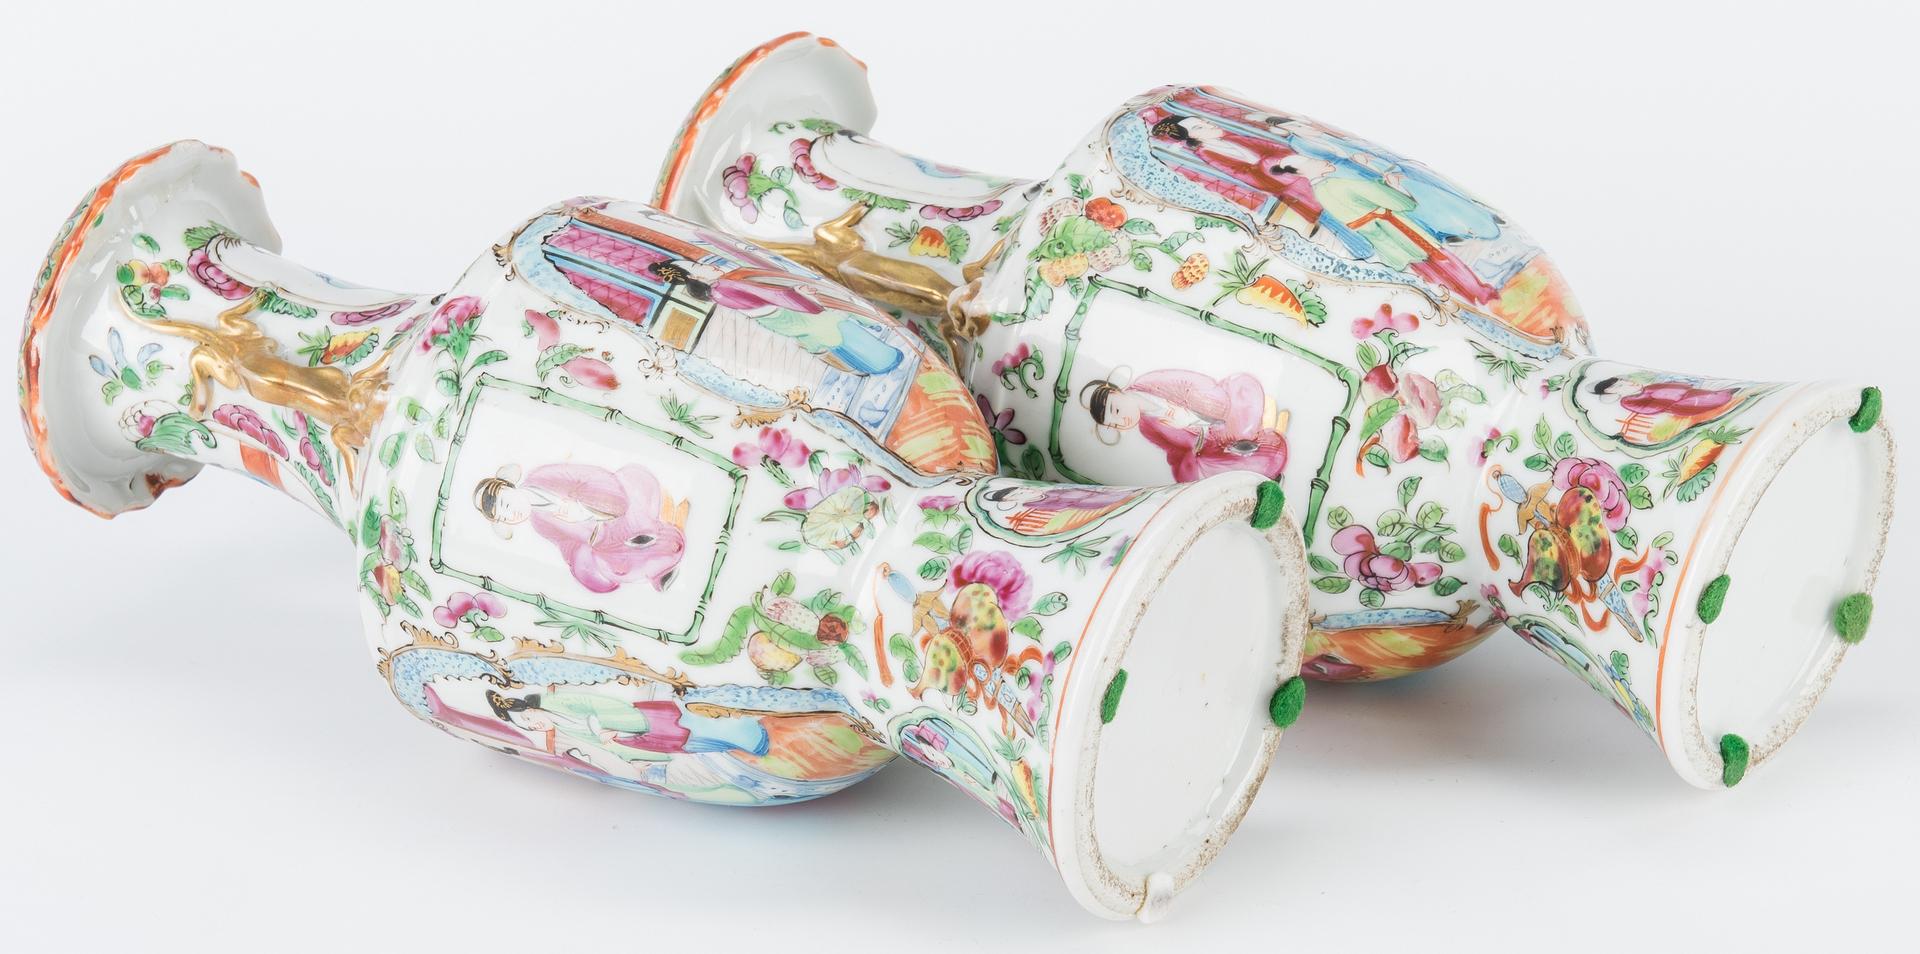 Lot 6: Pr. Chinese Export Porcelain Vases & Bowl, 3 pcs.